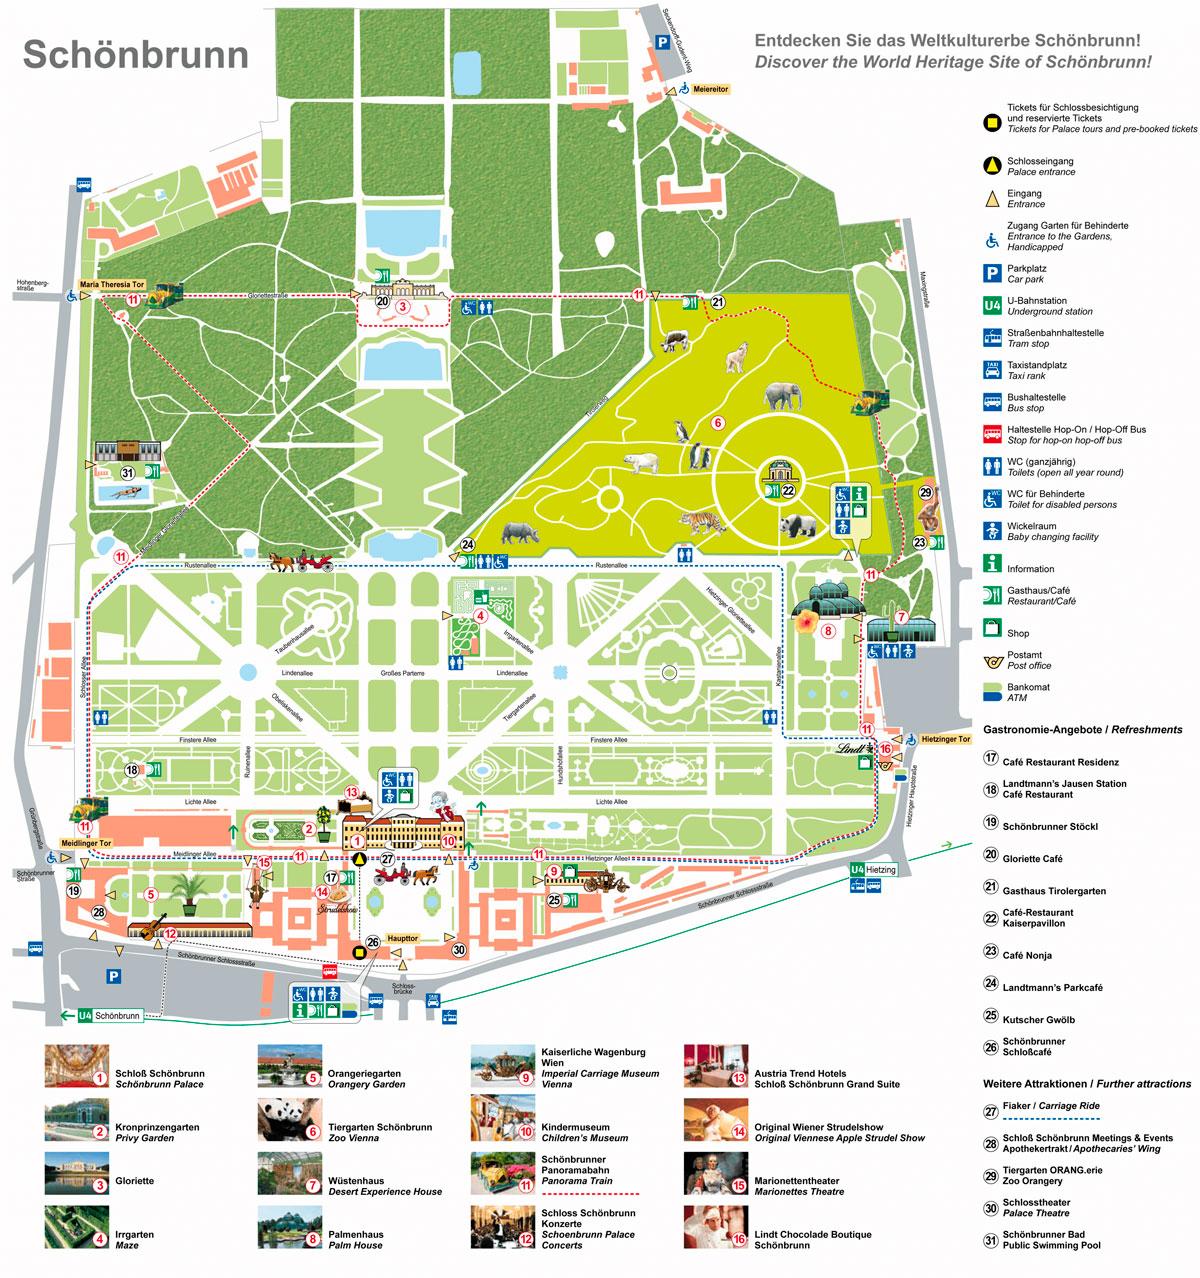 Схема дворца Шенбрунн